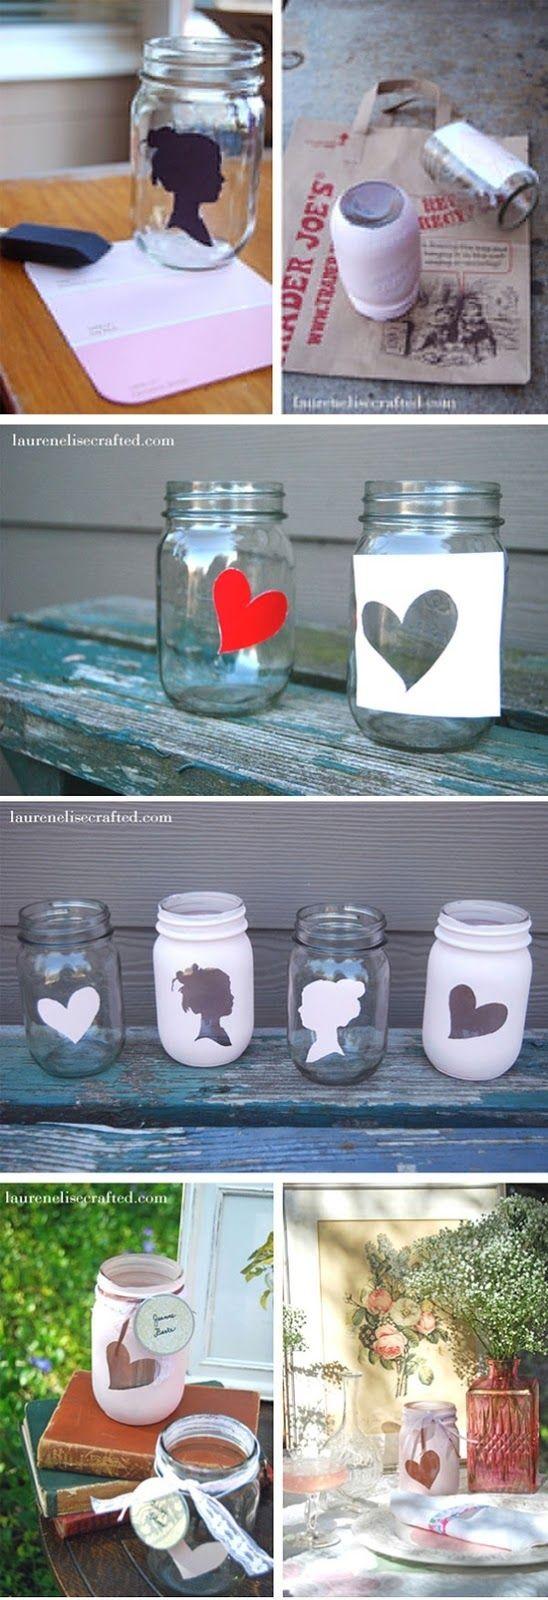 Painted silhouette & heart jars